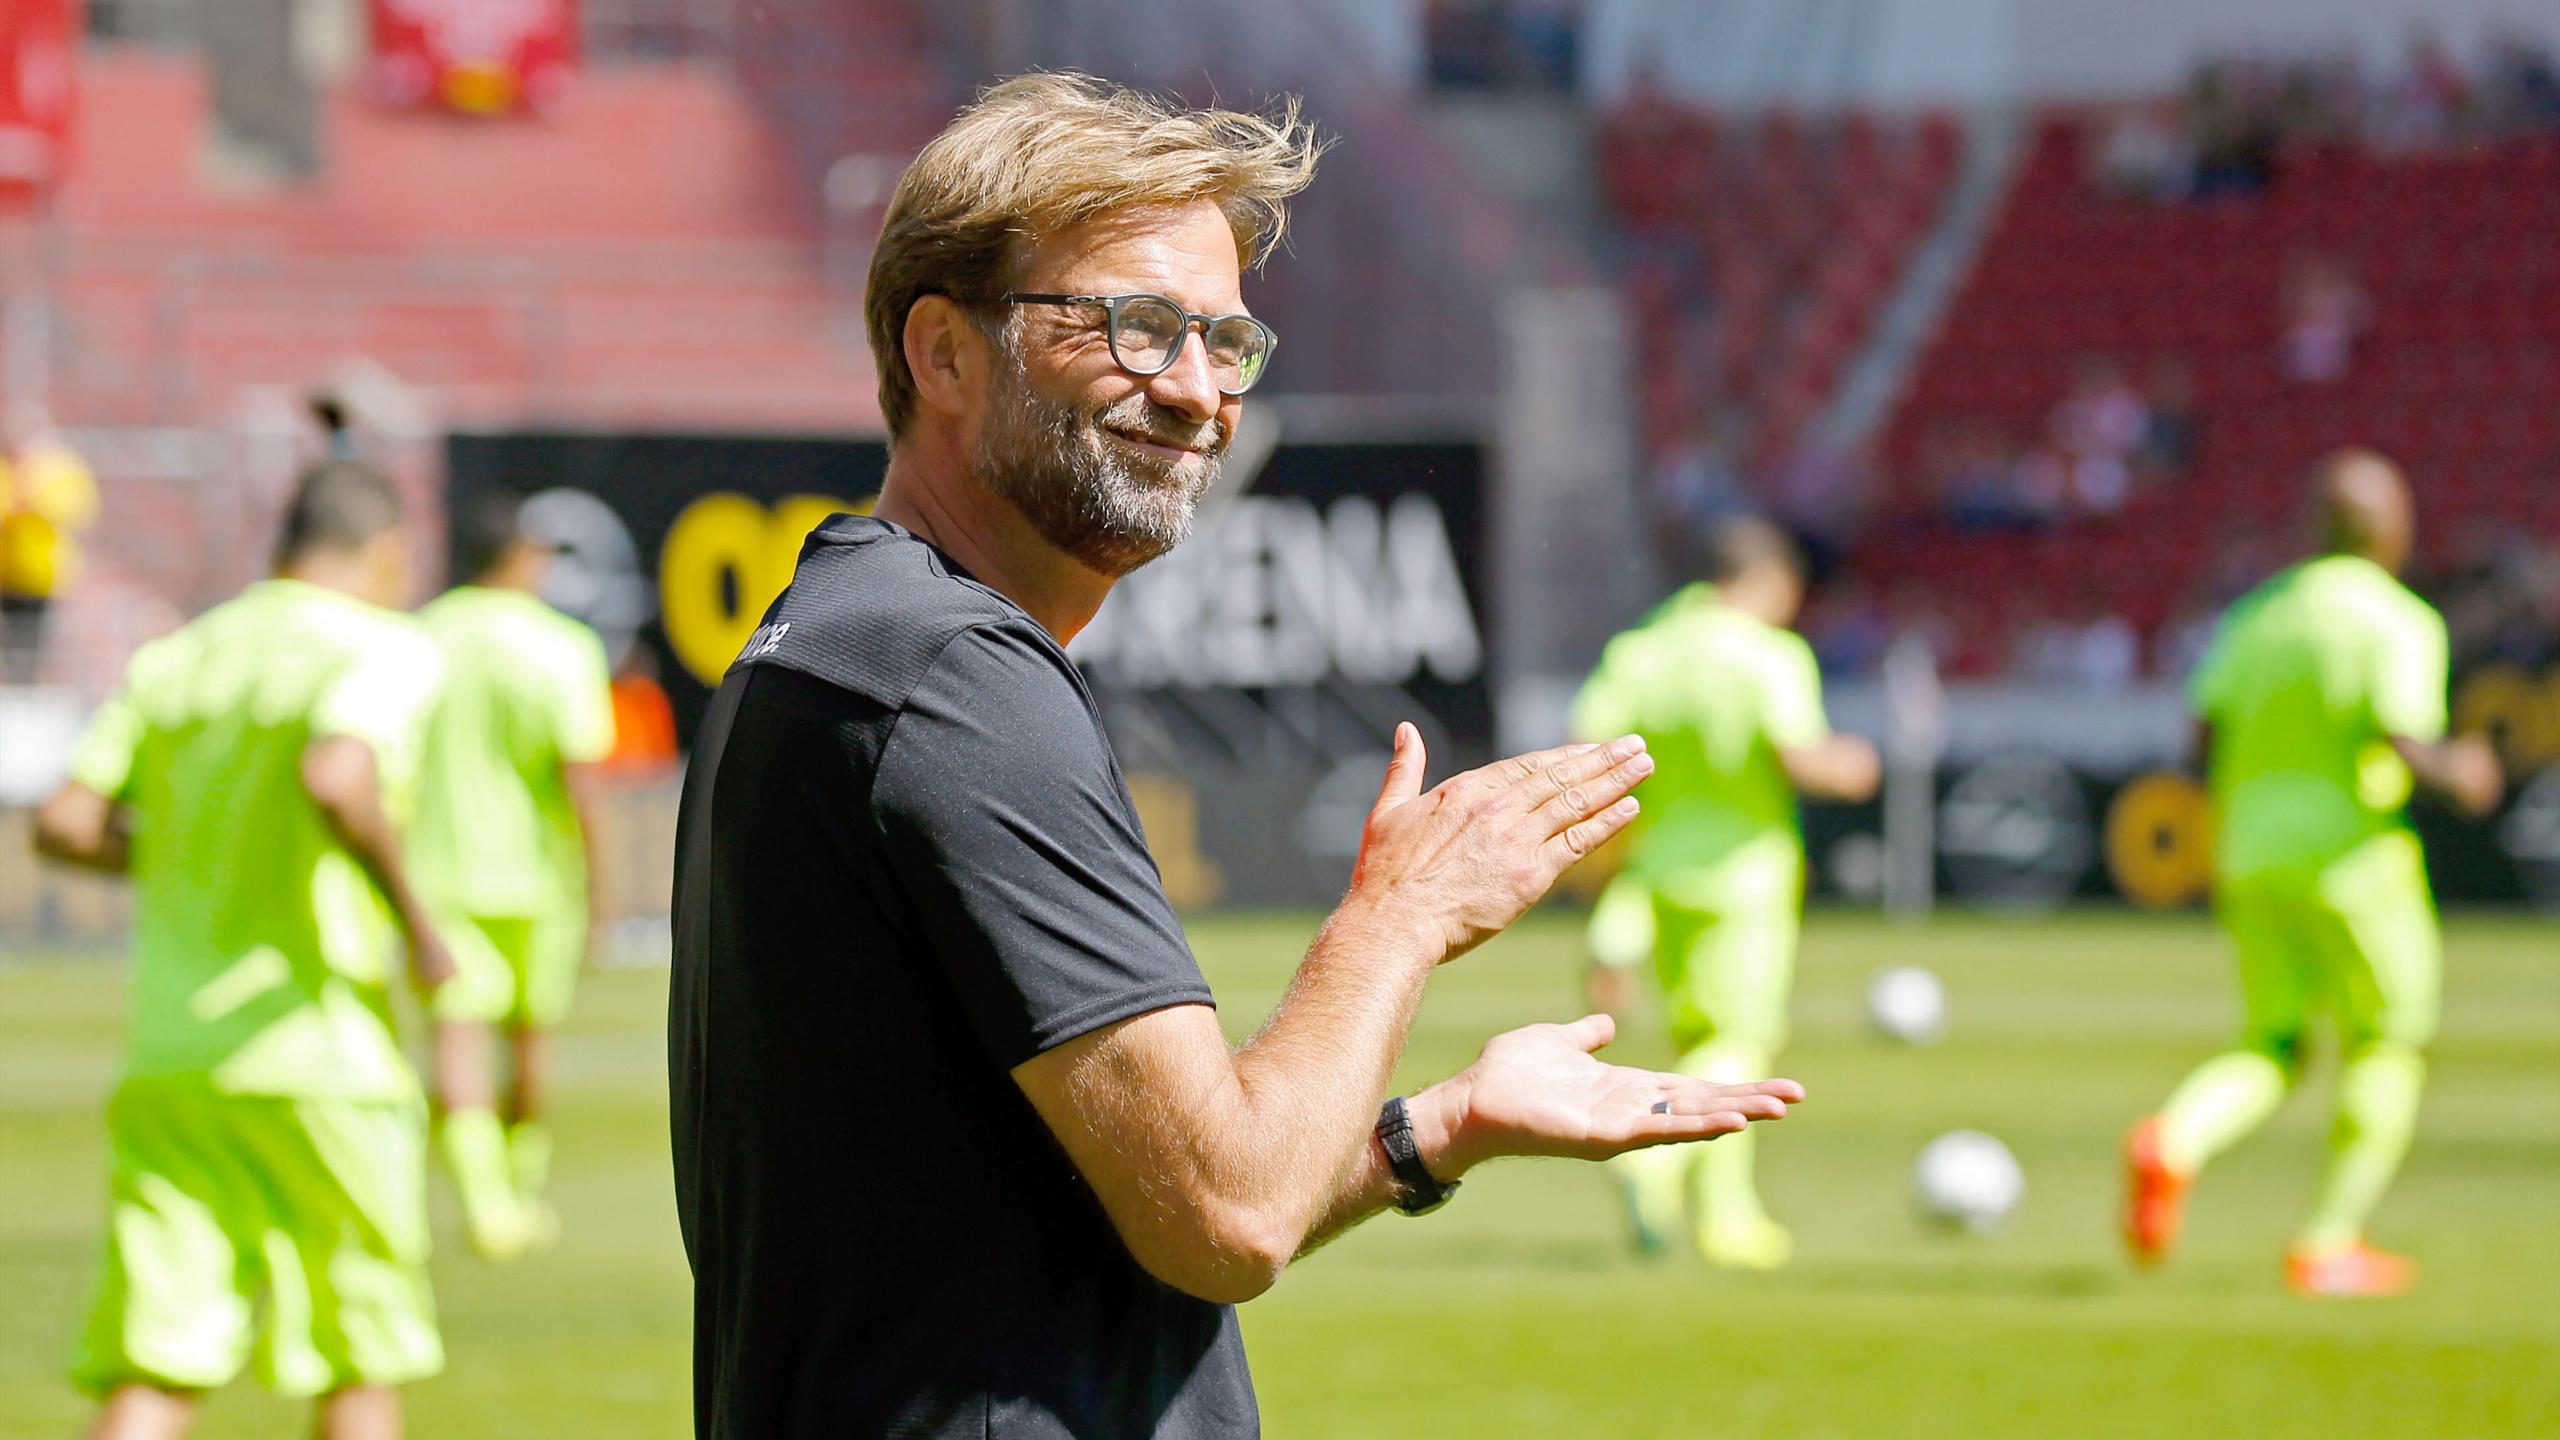 Liverpool's German manager Jurgen Klopp arrives for the friendly football match 1 FSV Mainz 05 vs Liverpool FC in Mainz